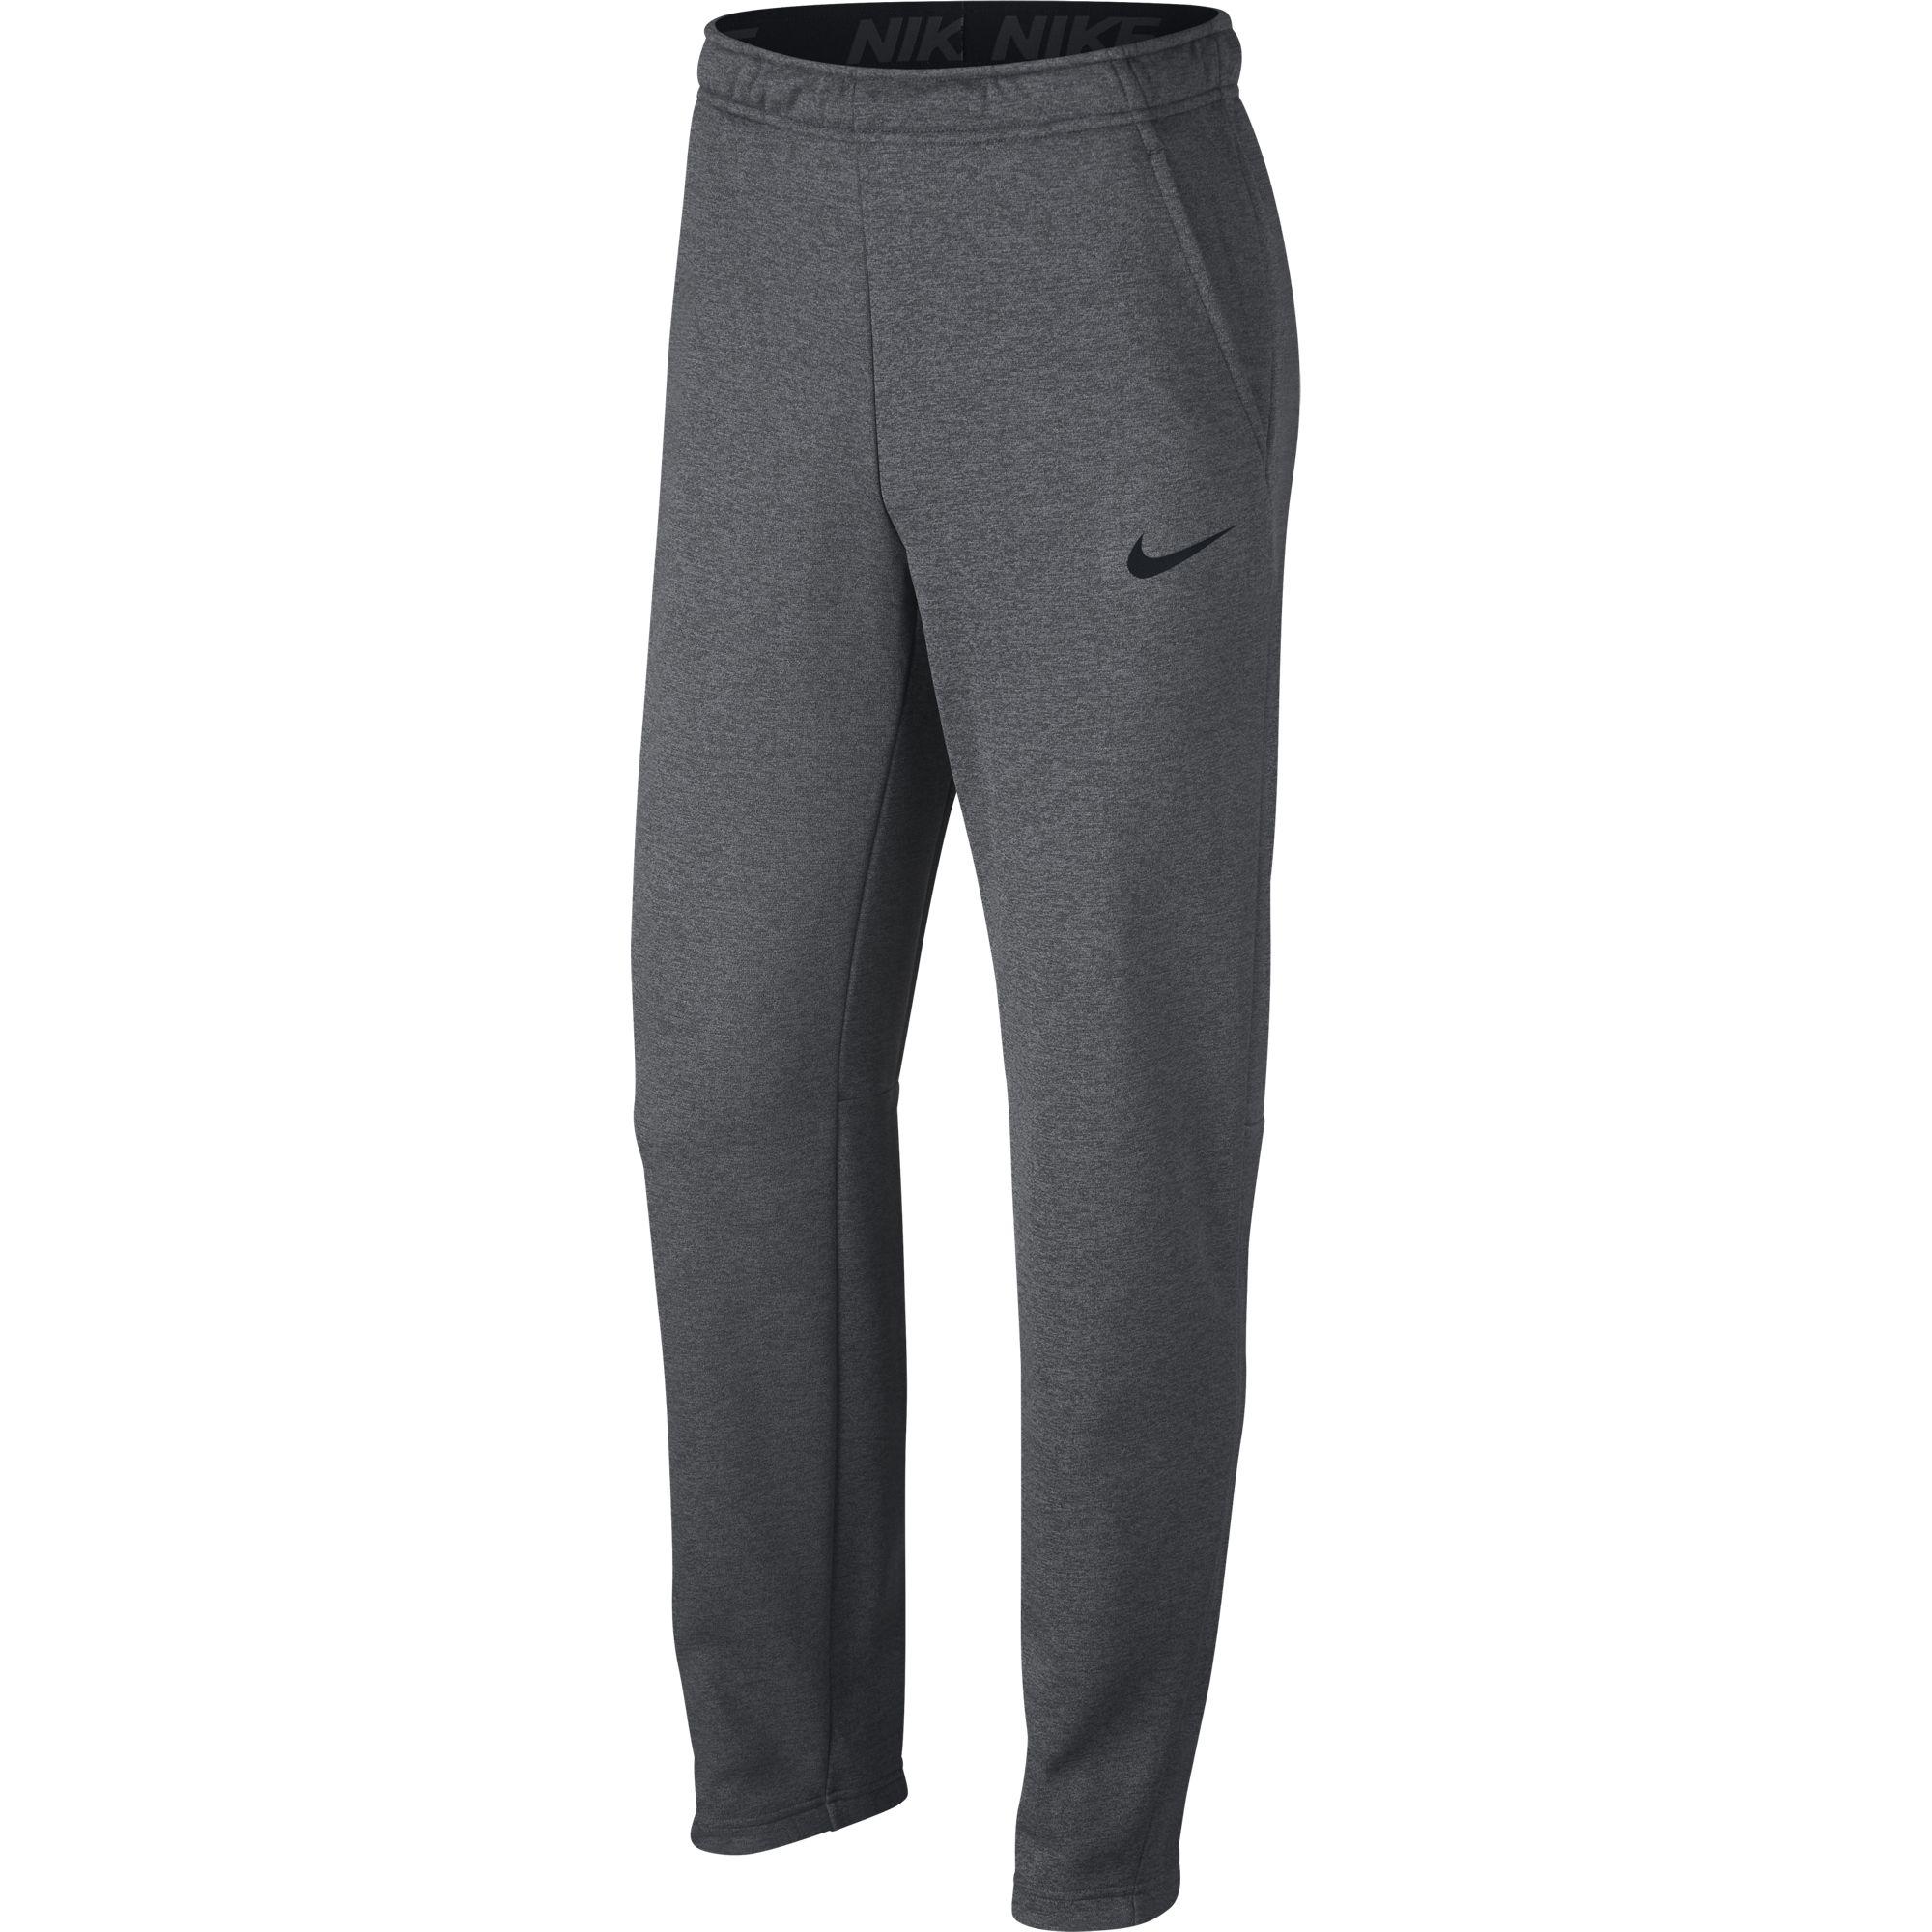 Men's Therma Fleece Pant, Charcoal/Black, swatch